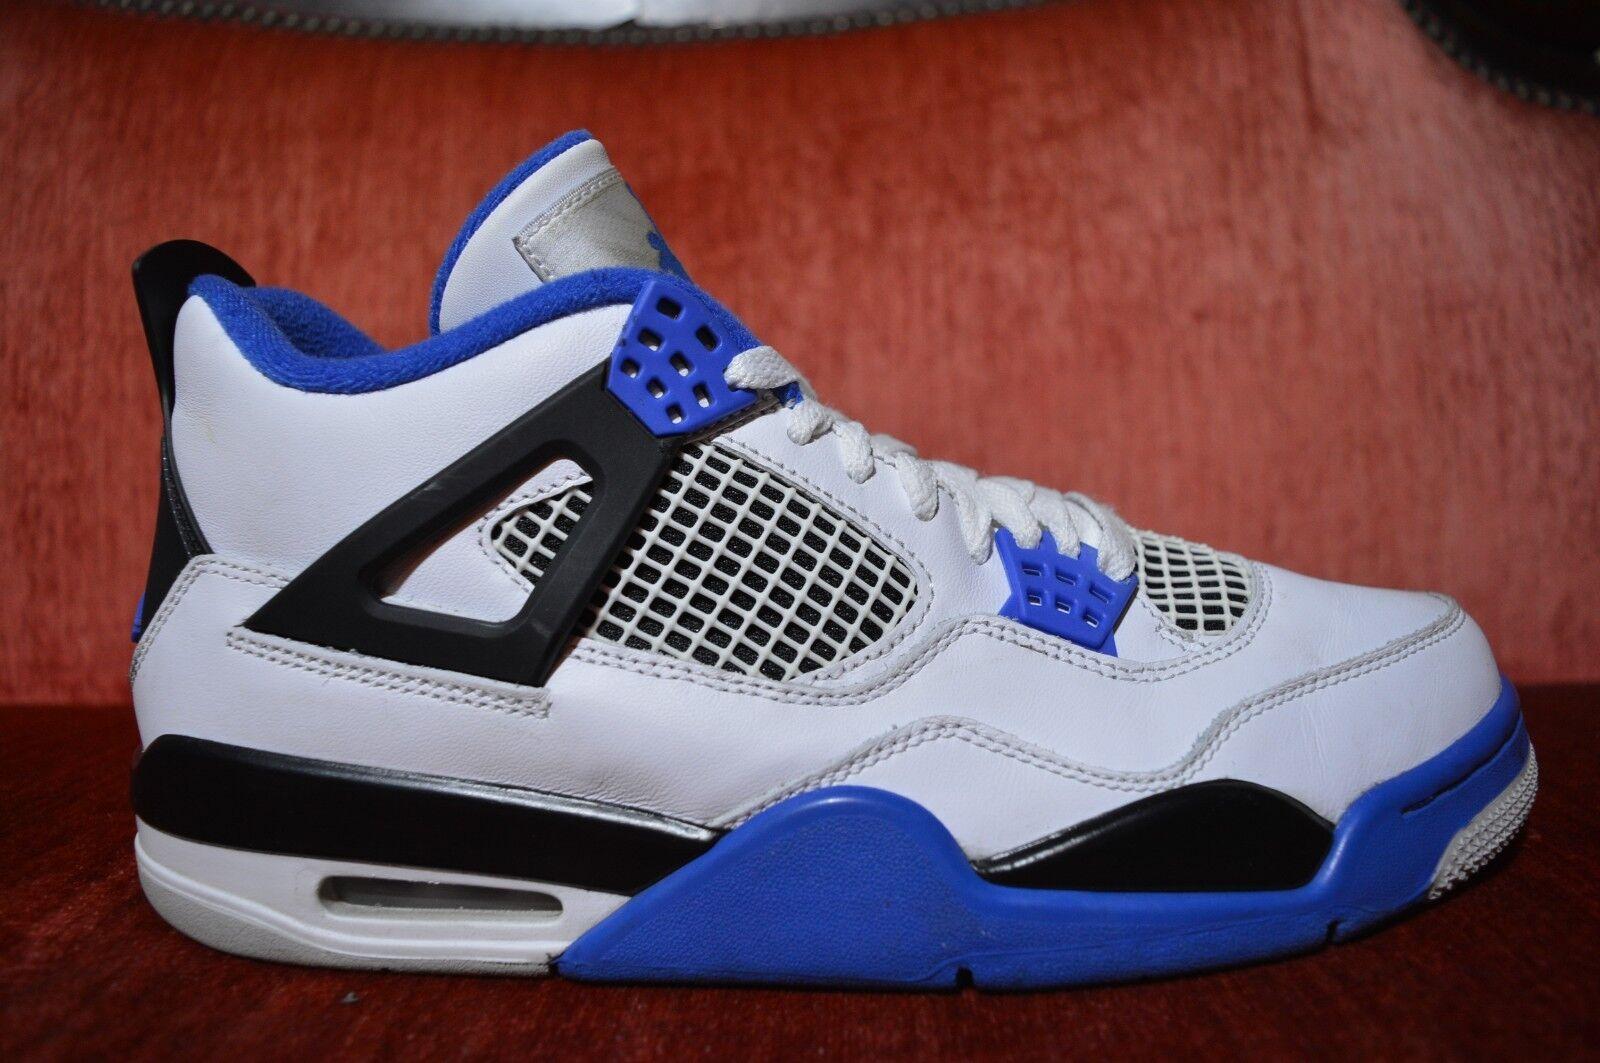 Nike air jordan 4 4 4 retro bianco nero blu 308497-117 motorsport Uomo dimensioni 9.5 bee9bd